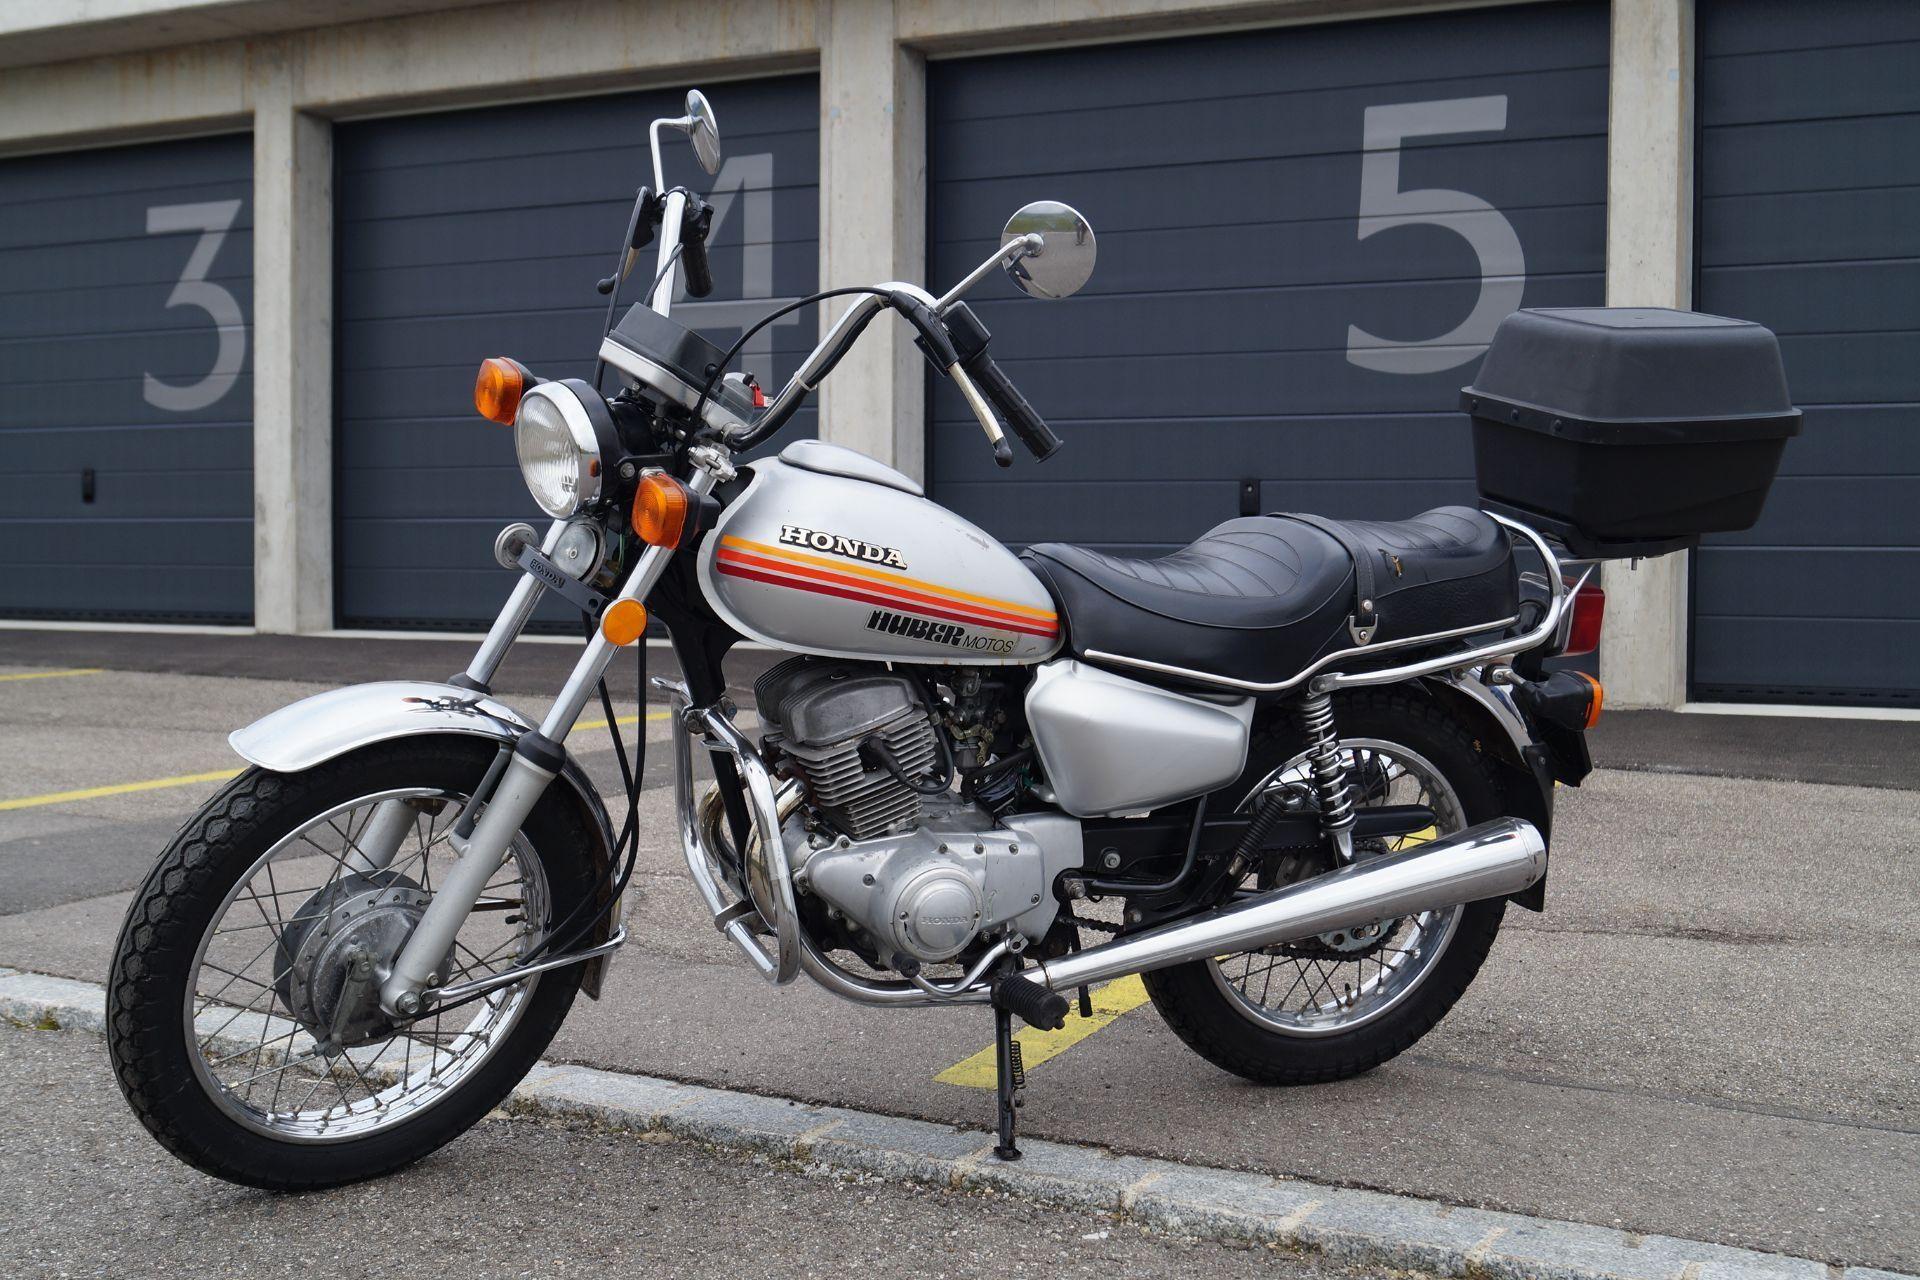 moto oldtimer acquistare honda cm 125 t motoshop ziegler schleitheim. Black Bedroom Furniture Sets. Home Design Ideas